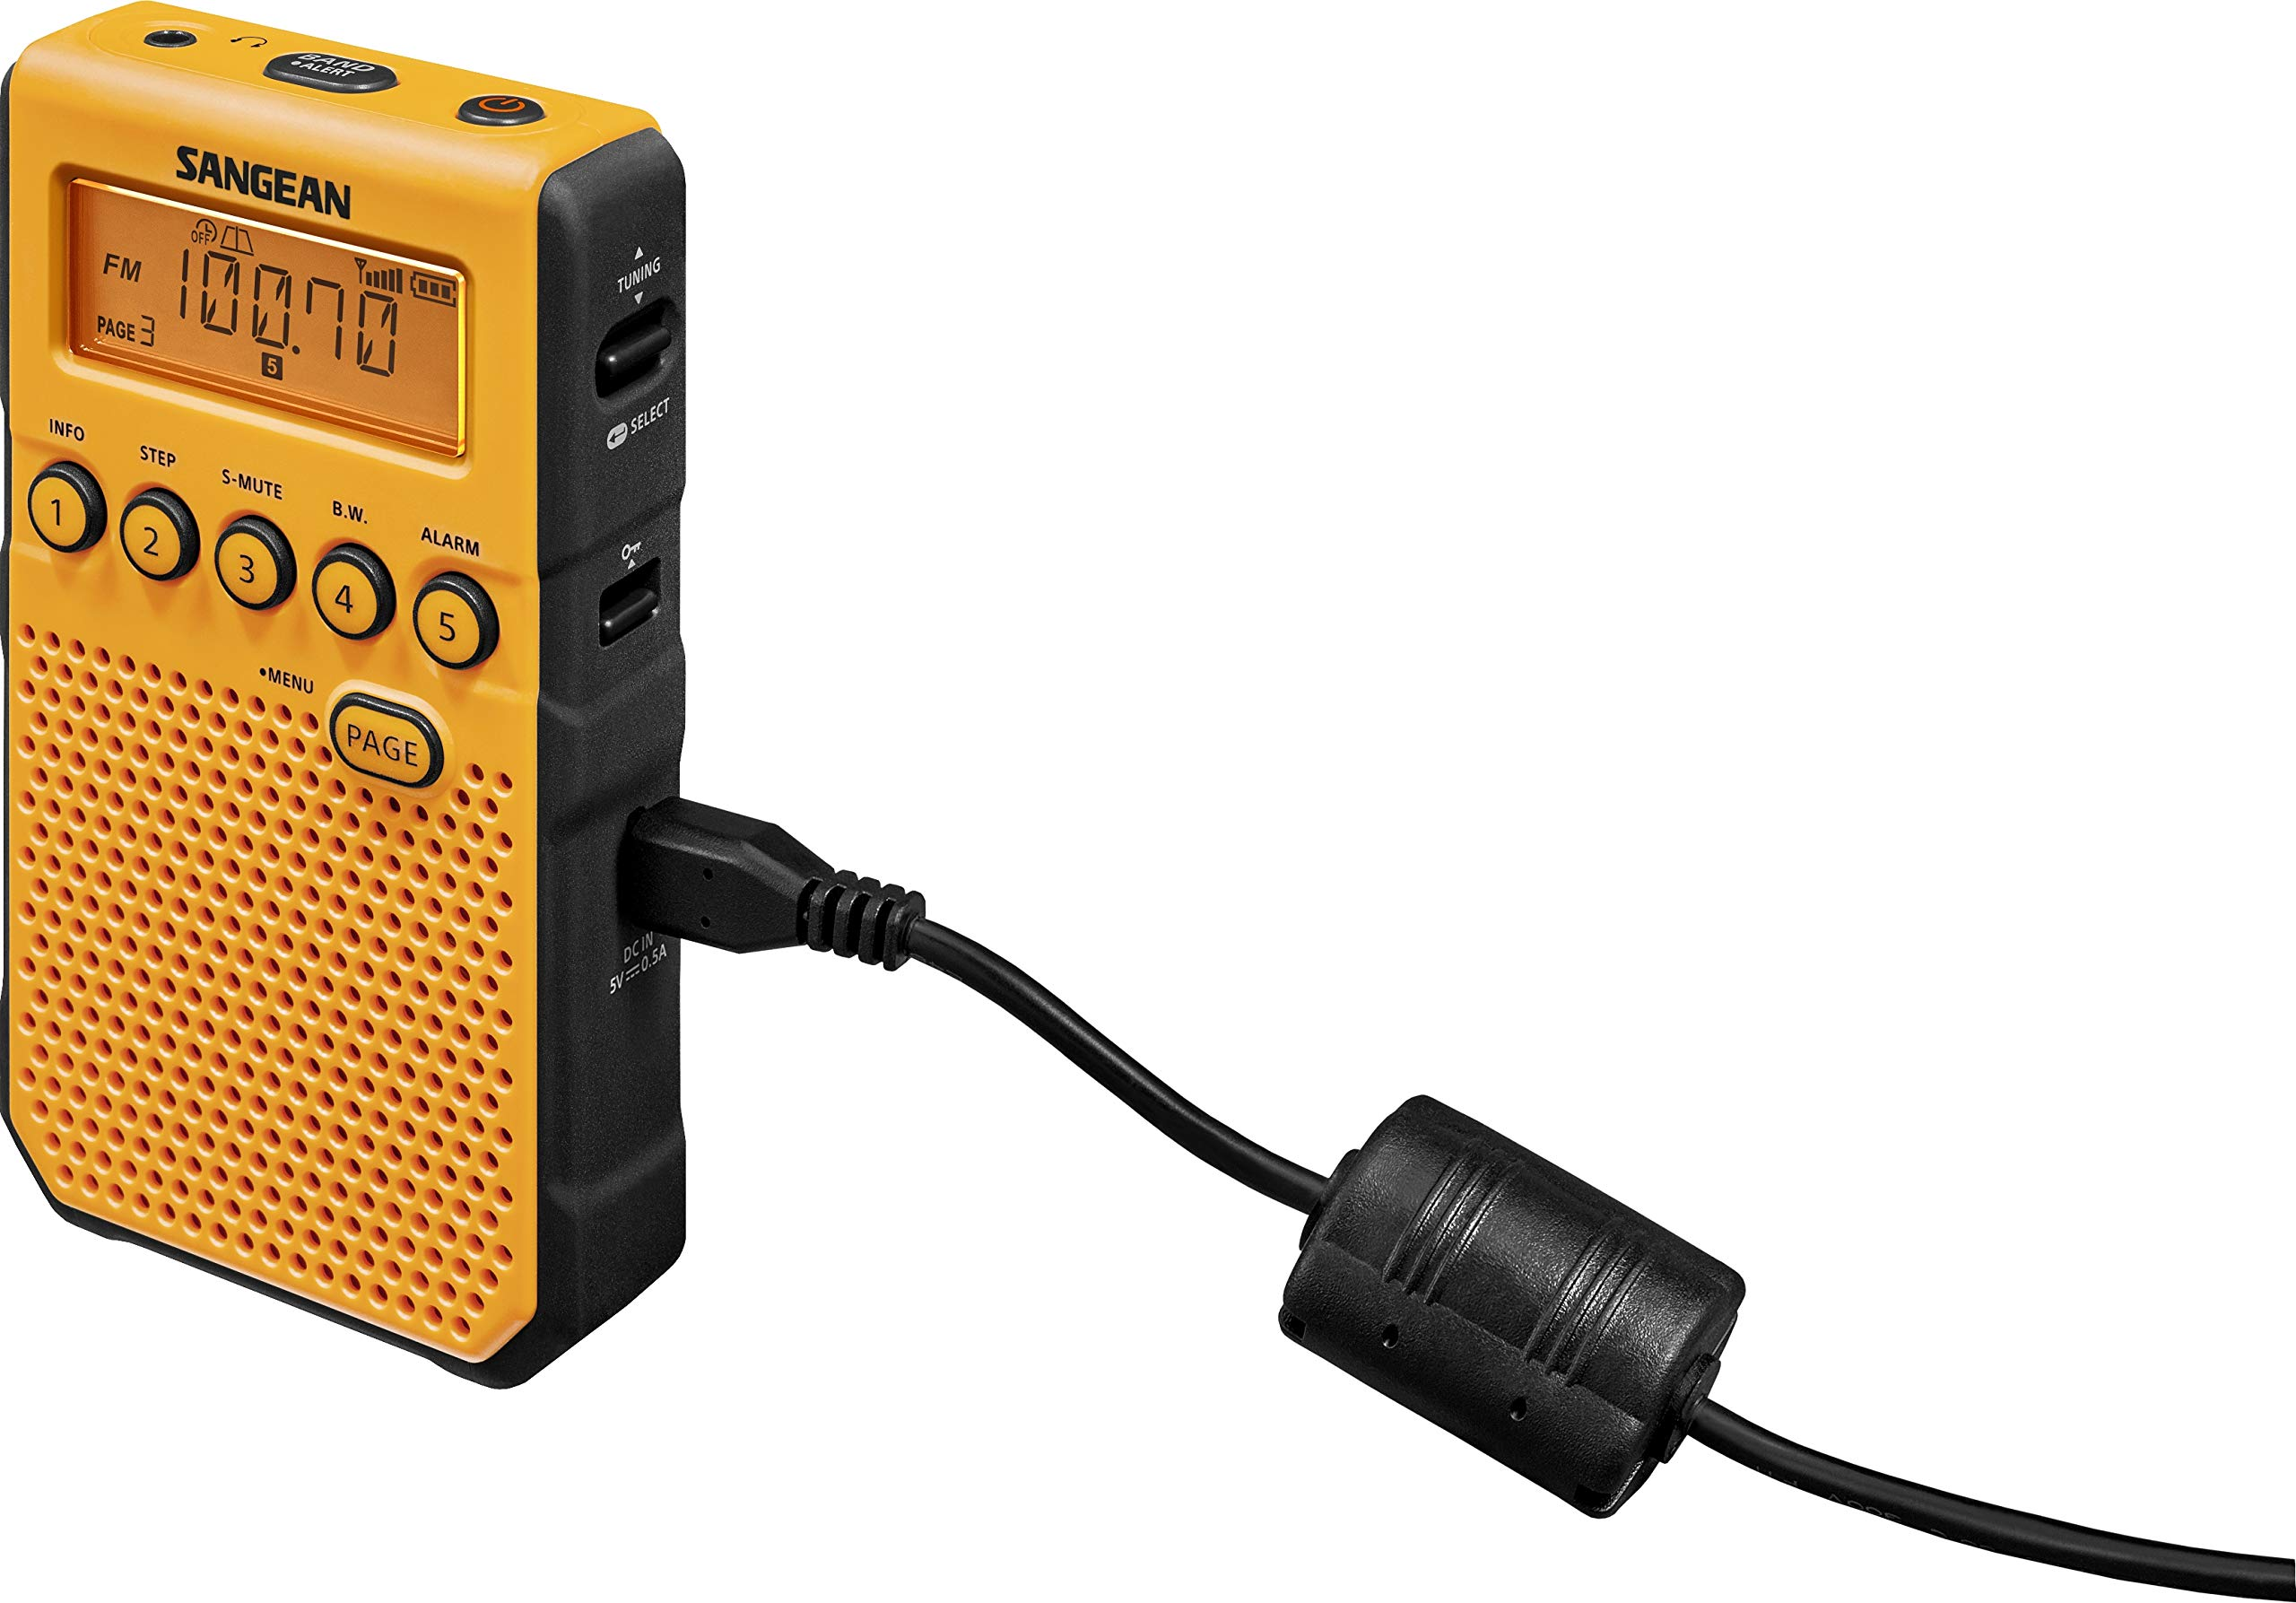 Sangean DT-800YL AM / FM / NOAA Weather Alert Rechargeable Pocket Radio (Yellow) by Saugeen America, Inc. (Image #4)